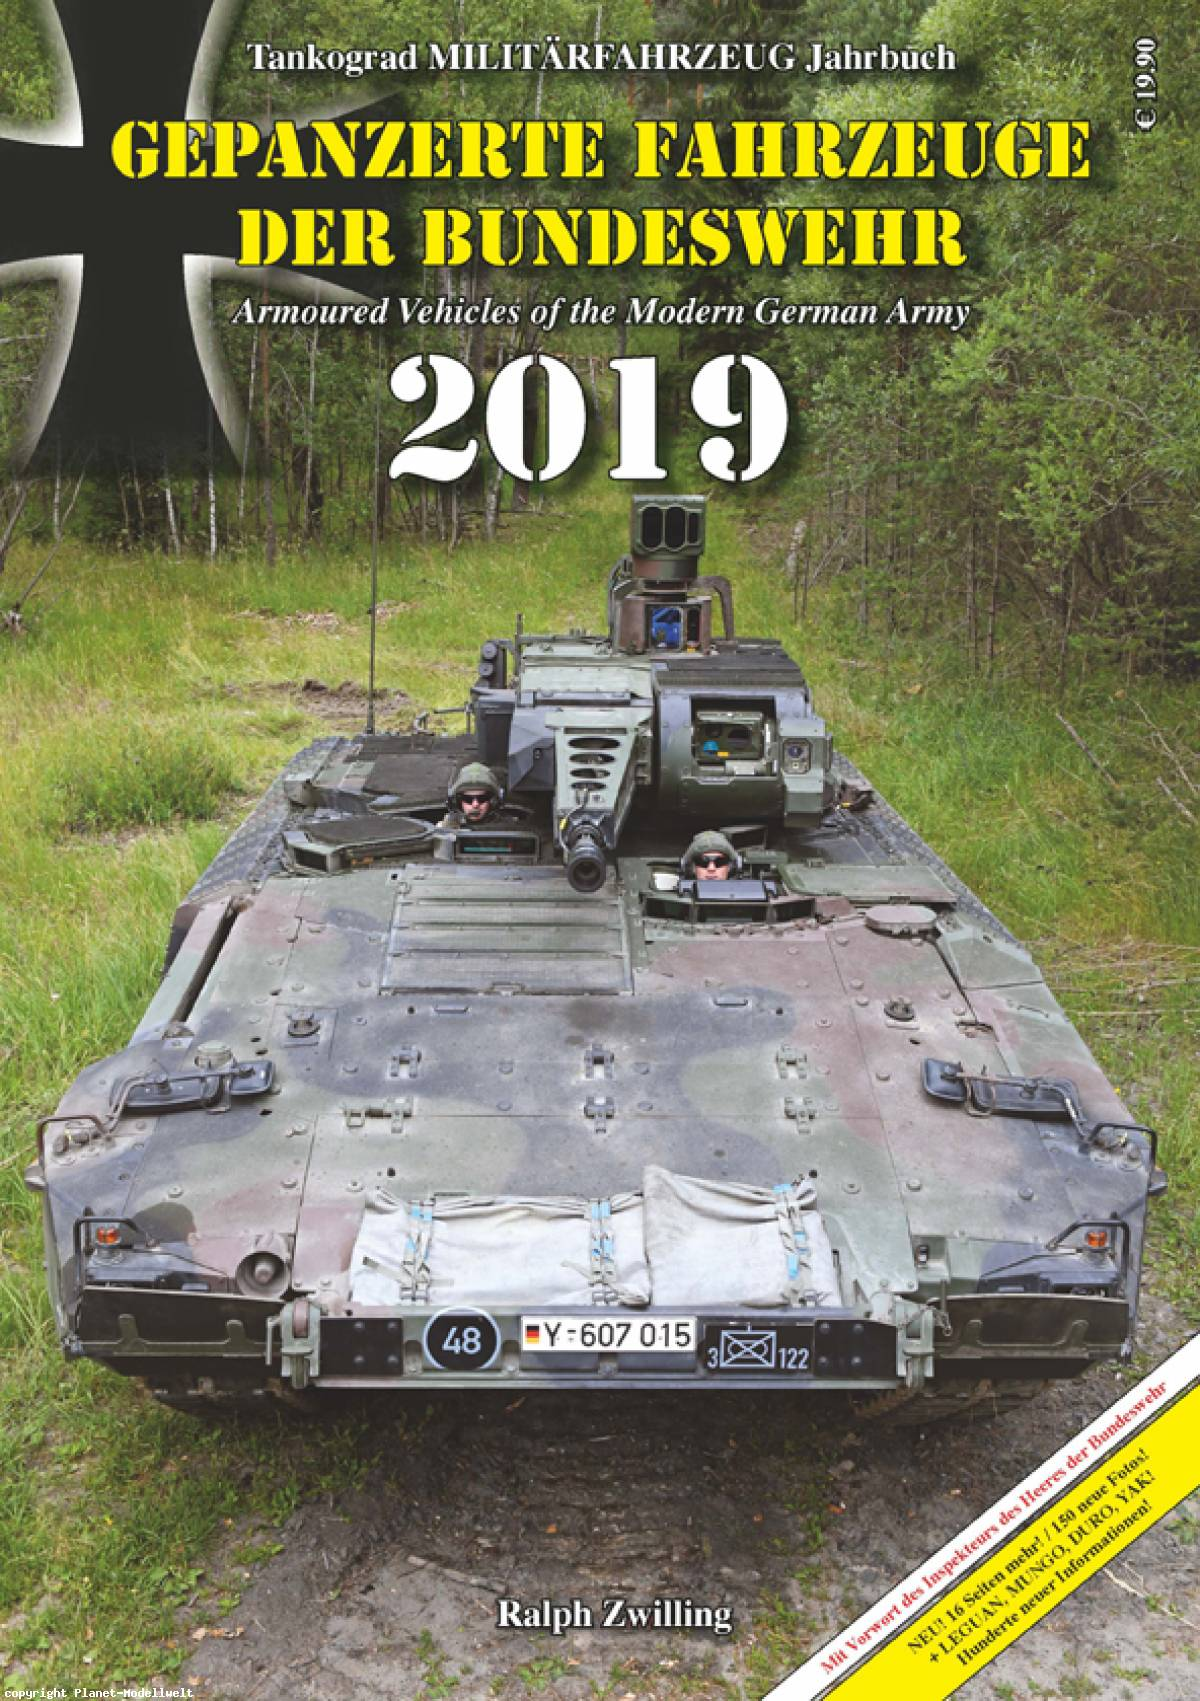 Tankograd Tankograd Jahrbuch 2020 NEU 11//2019 AUF LAGER /&